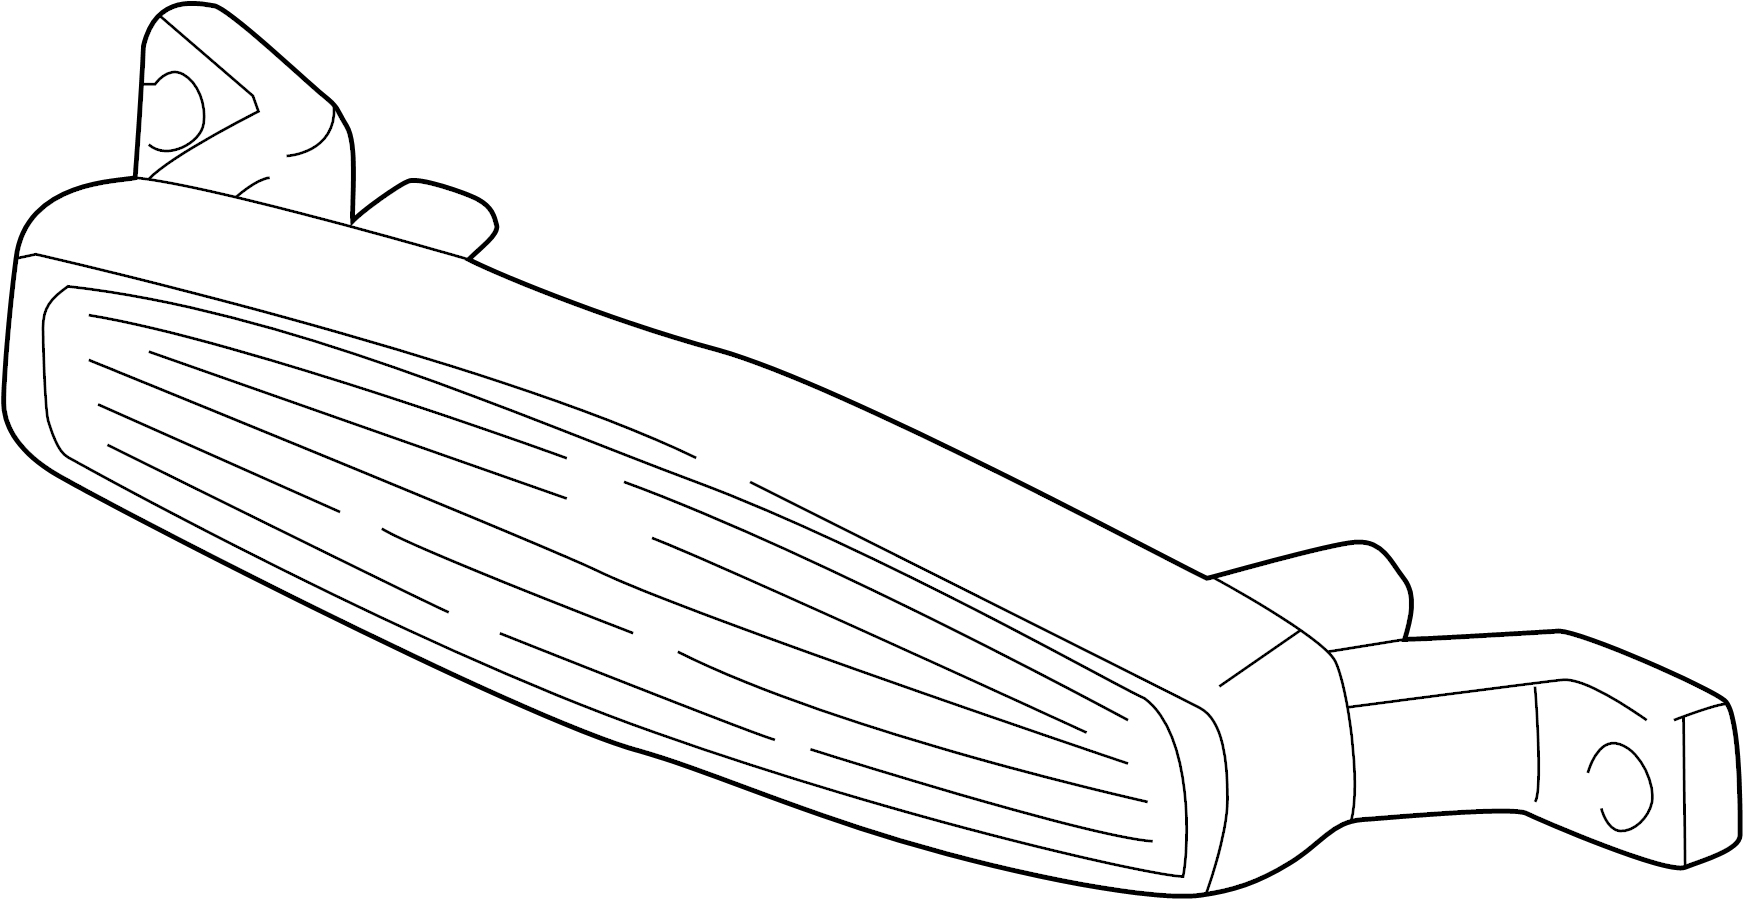 Chevrolet Monte Carlo High Mount Lamp Lamp